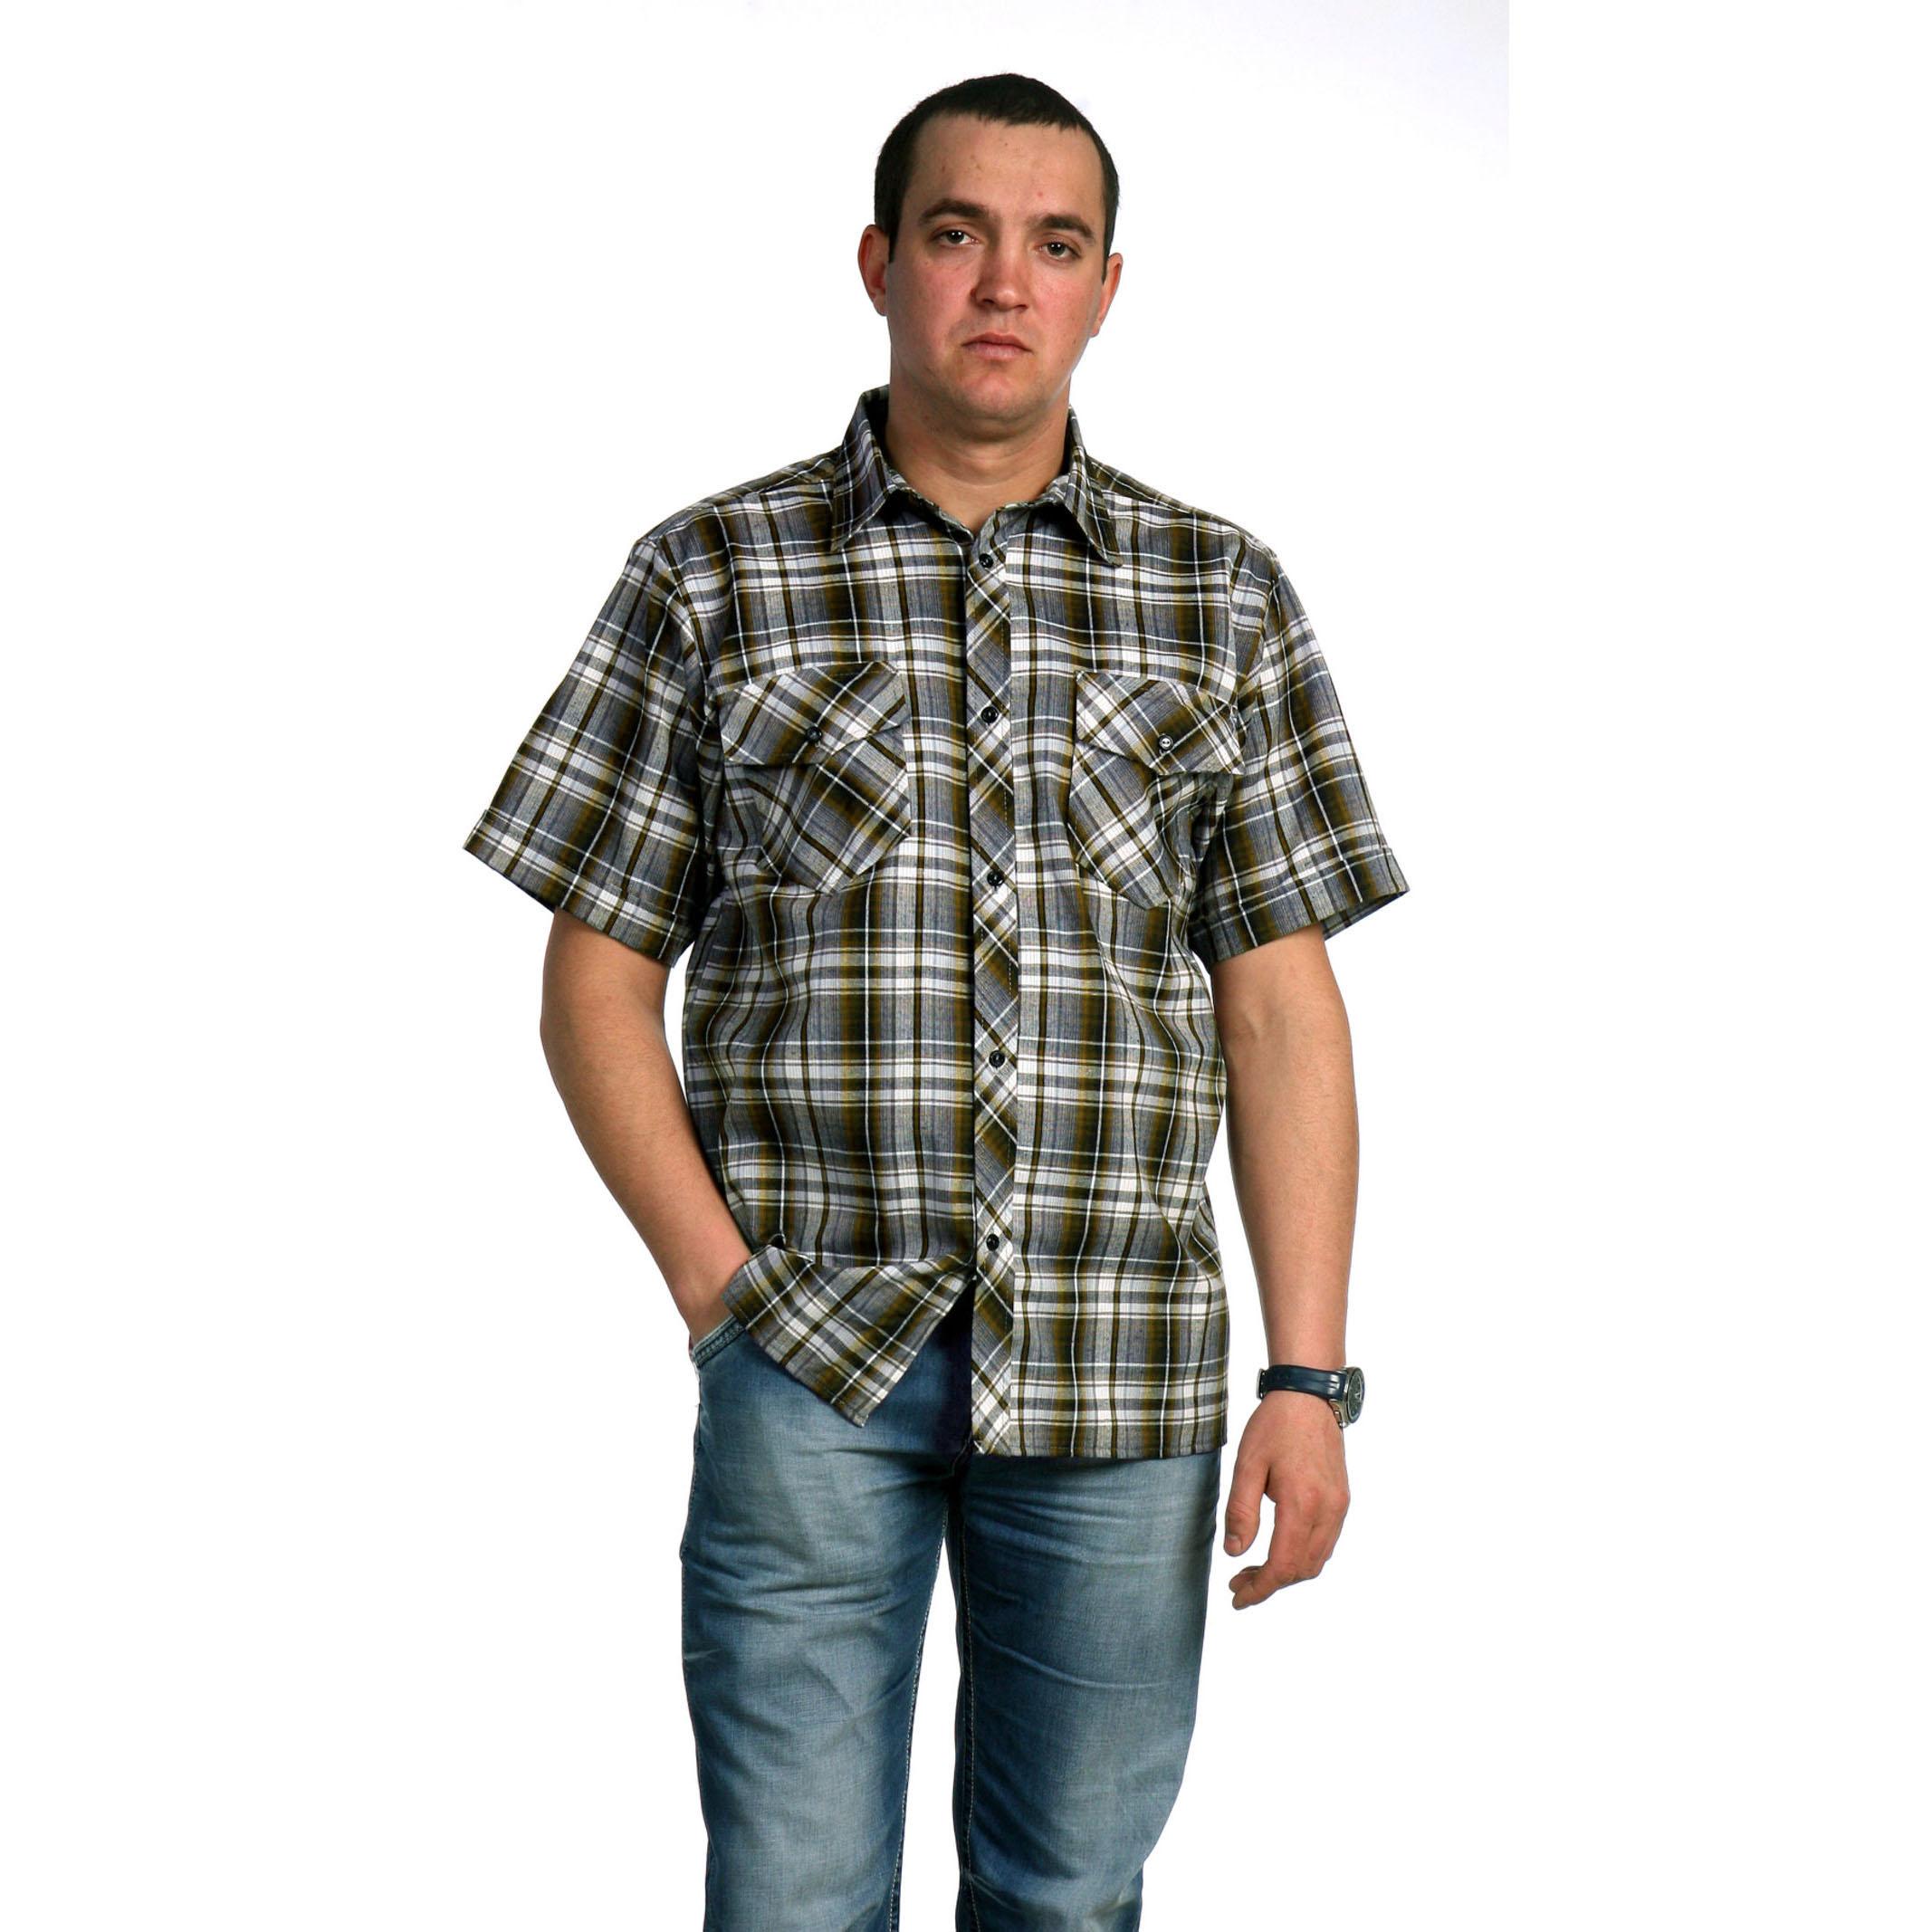 Мужская рубашка «Аллан» арт. 0012, размер 46 Лика Дресс